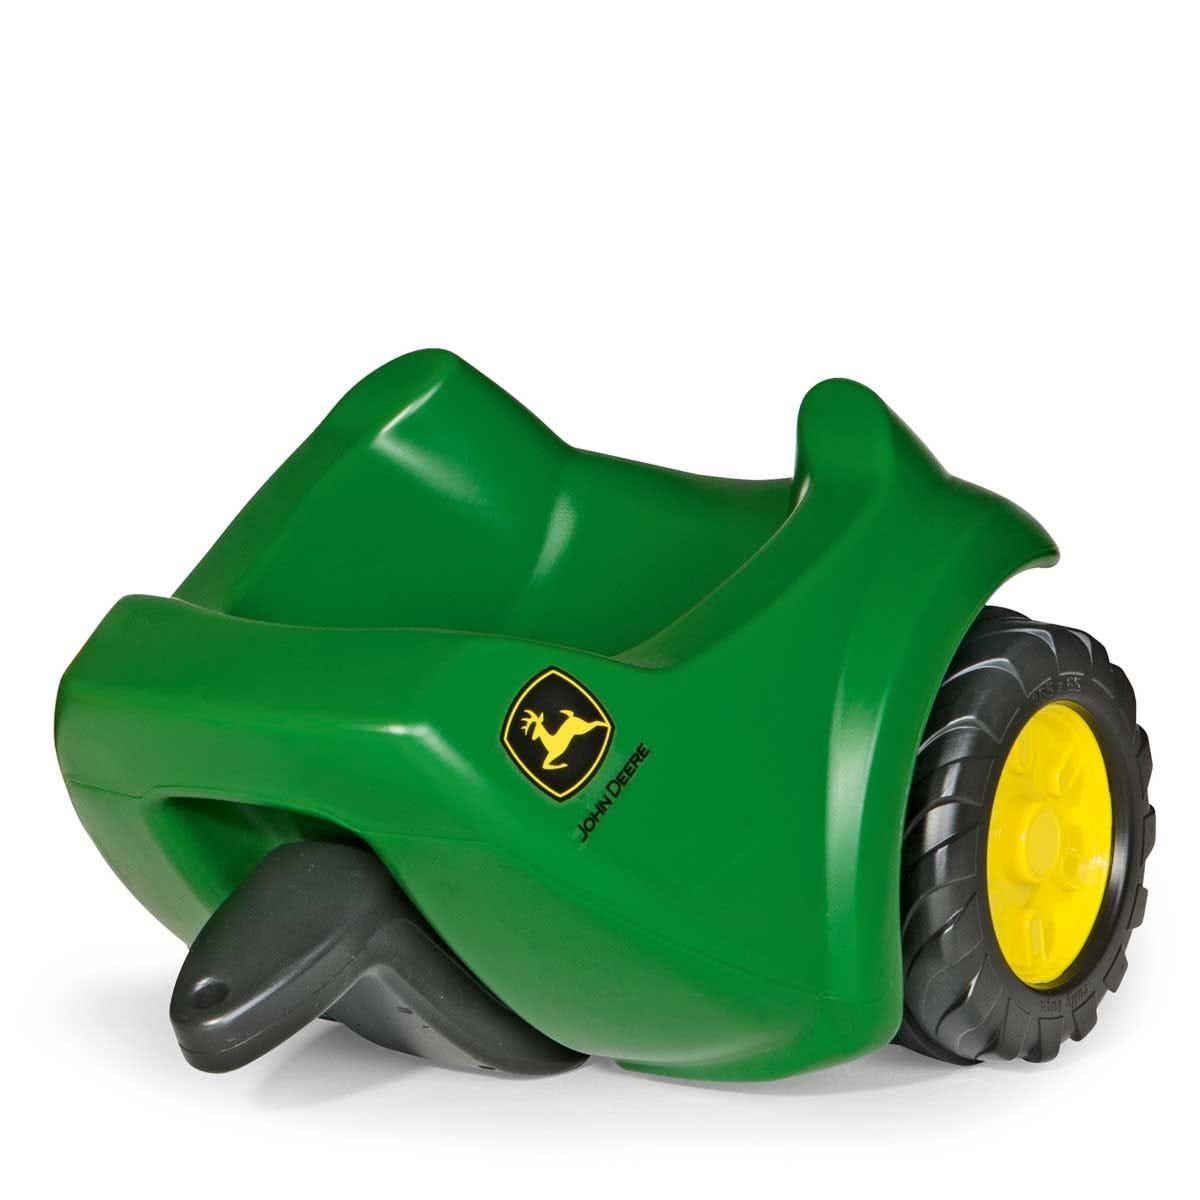 John Deere Kid's Mini Tractor Trailer